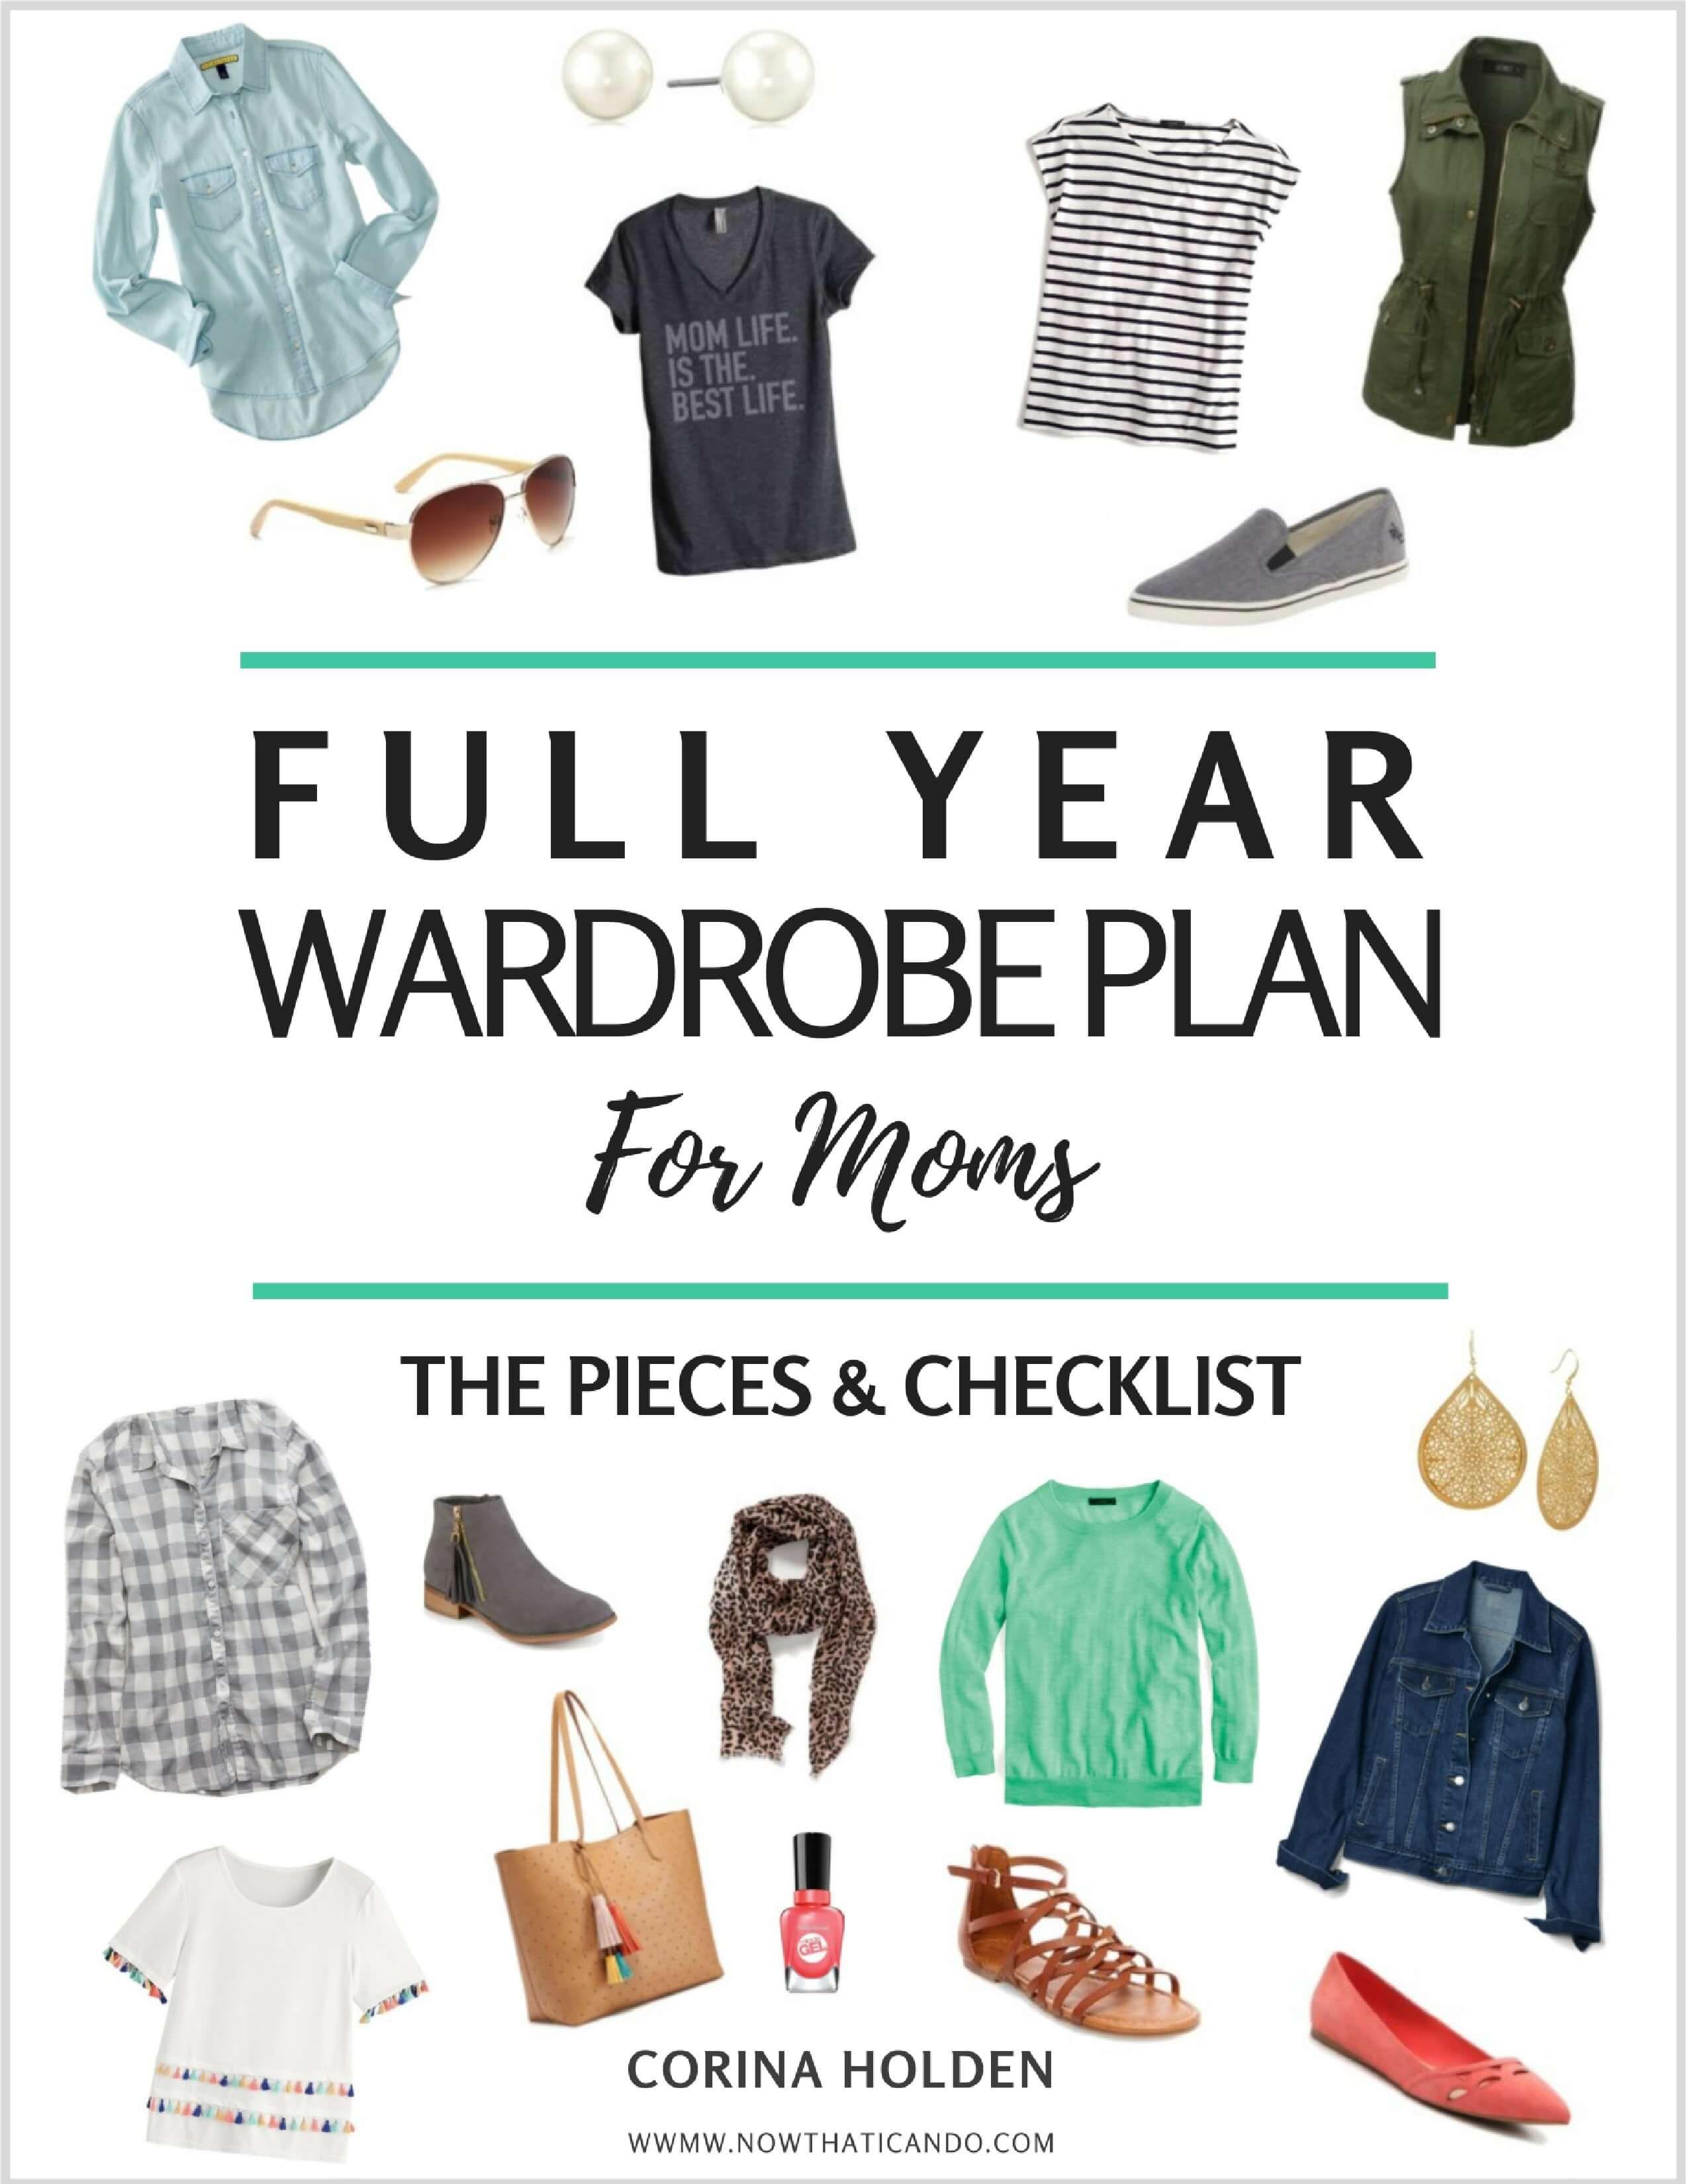 Free Capsule Wardrobe Plan For Moms Wardrobe Essentials